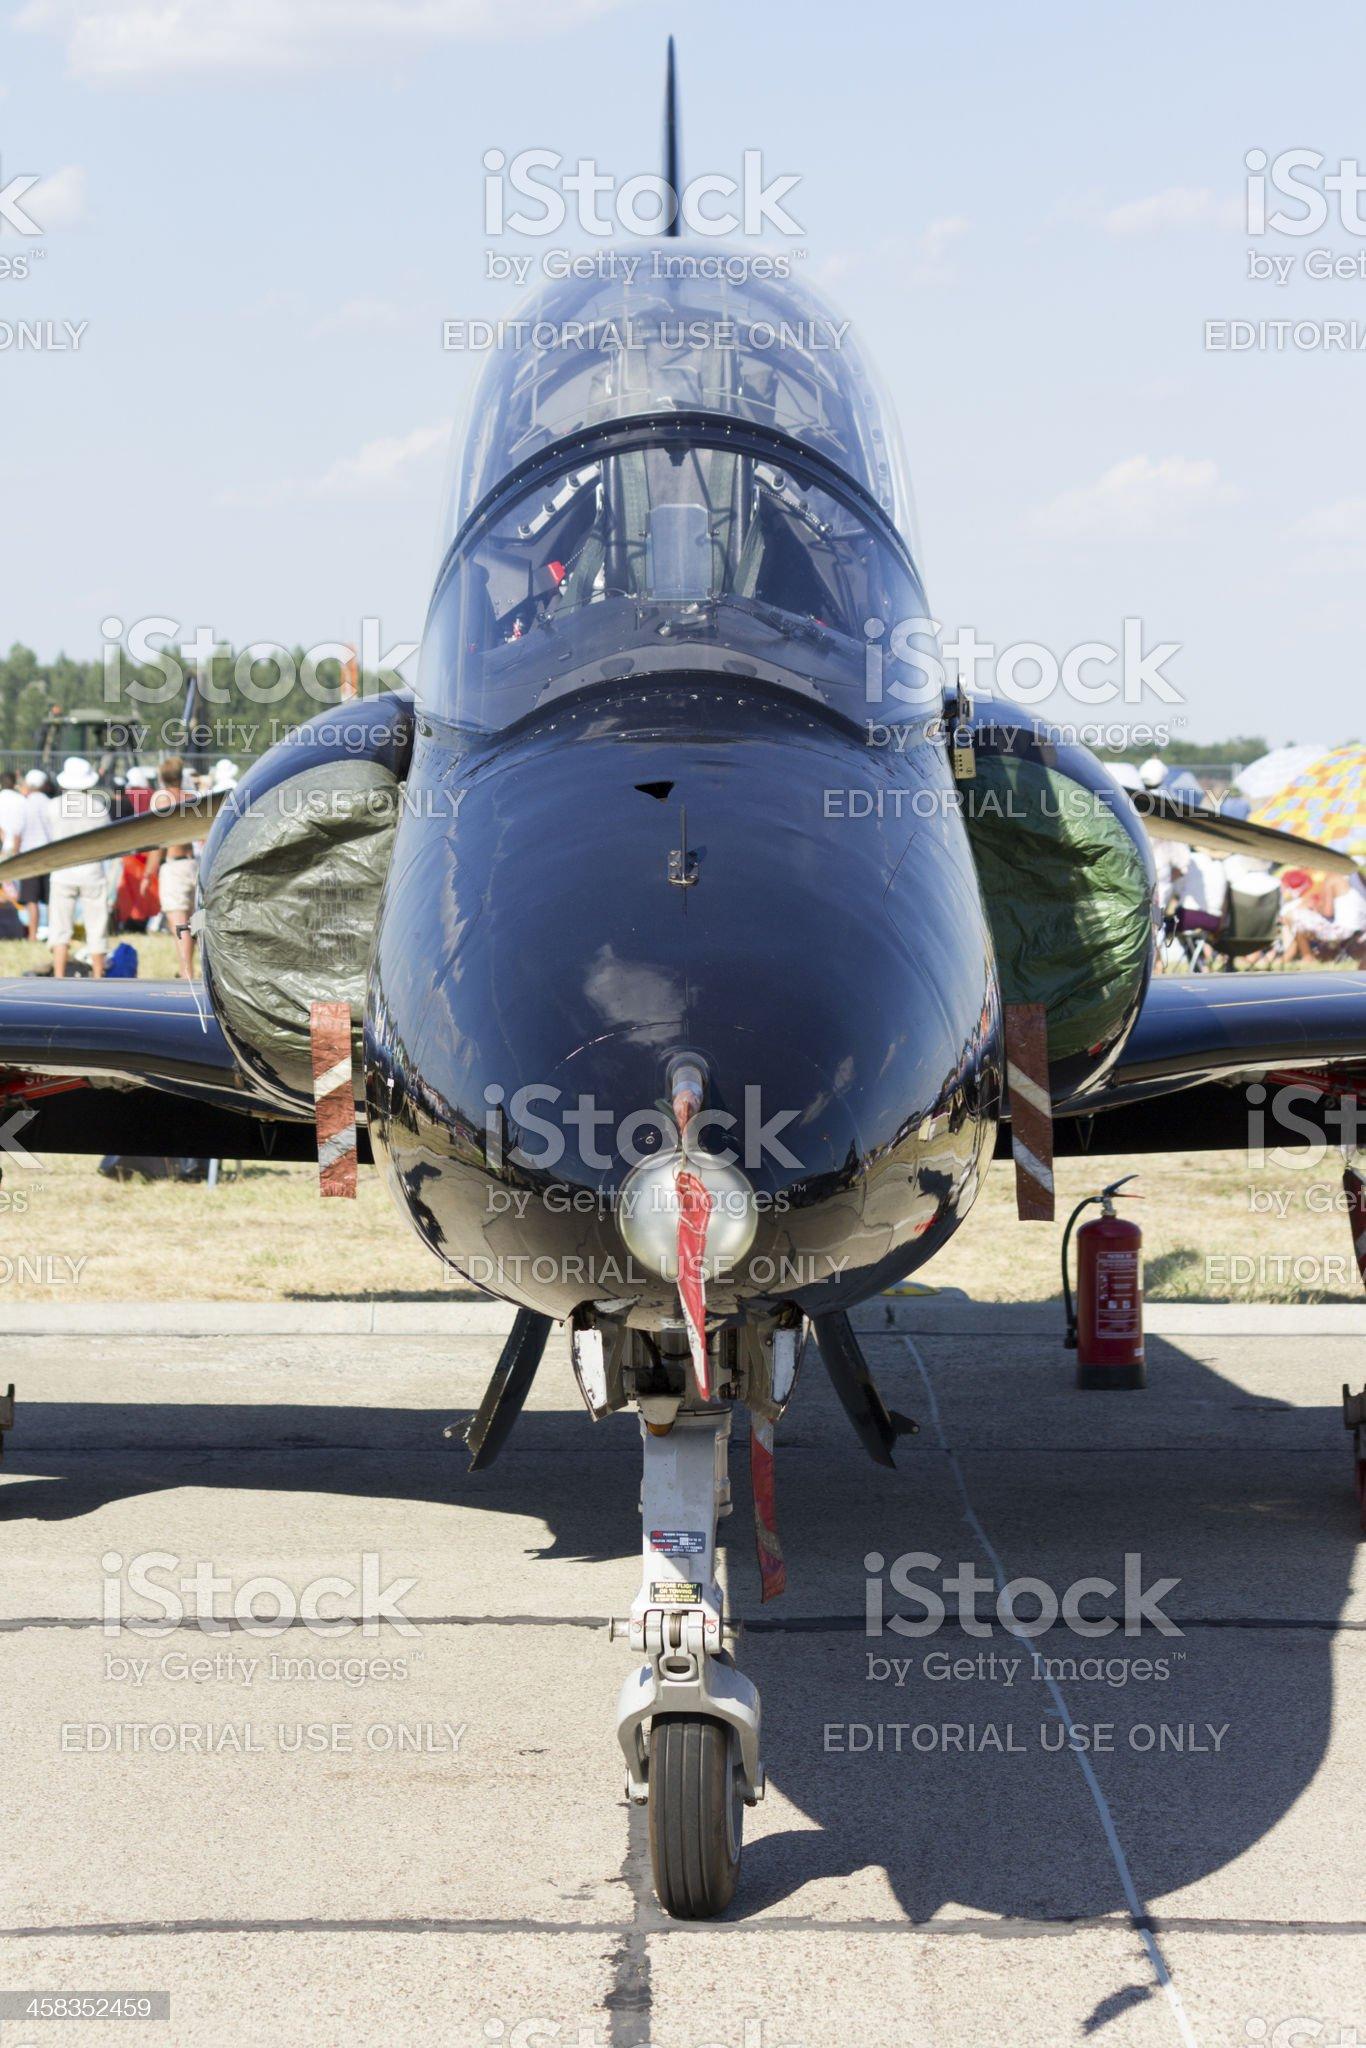 Hawk trainer jet royalty-free stock photo